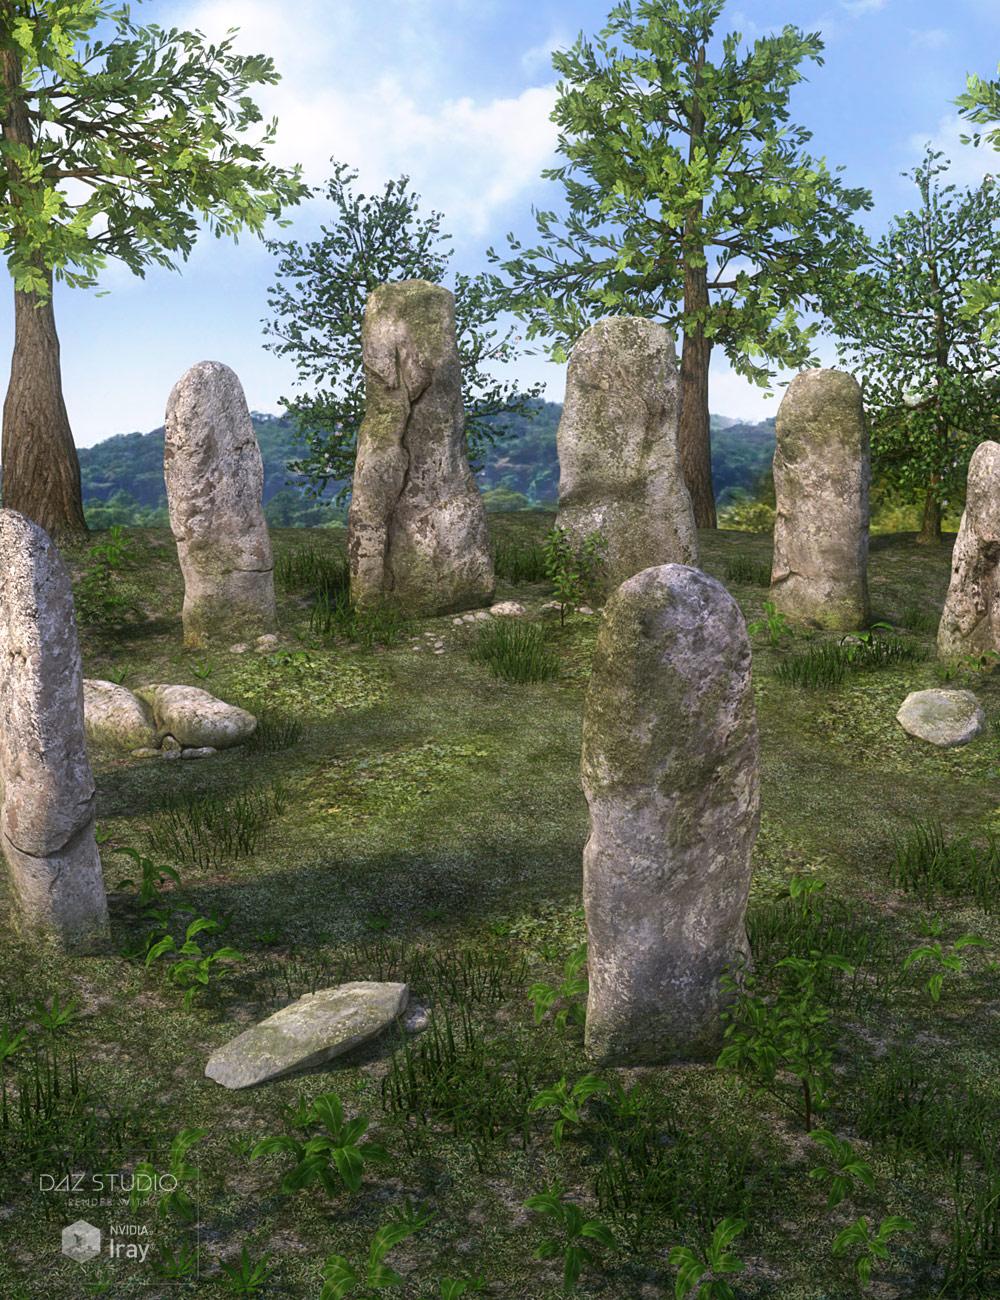 DM's Stones of Graith by: Daniemarforno, 3D Models by Daz 3D